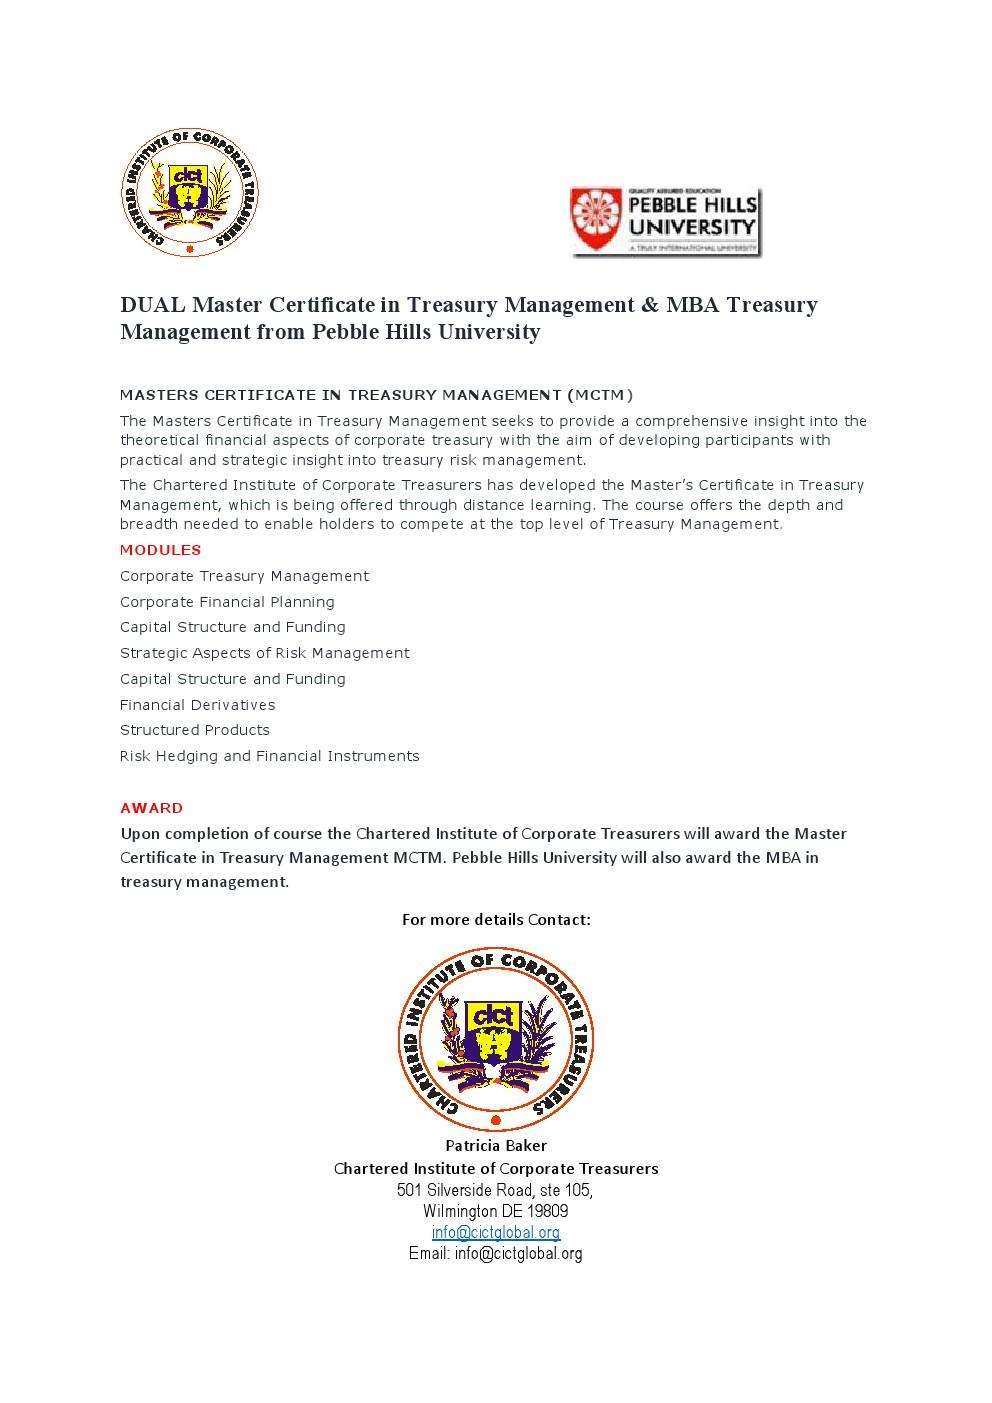 DUAL Master Certificate in Treasury Management2 (1)